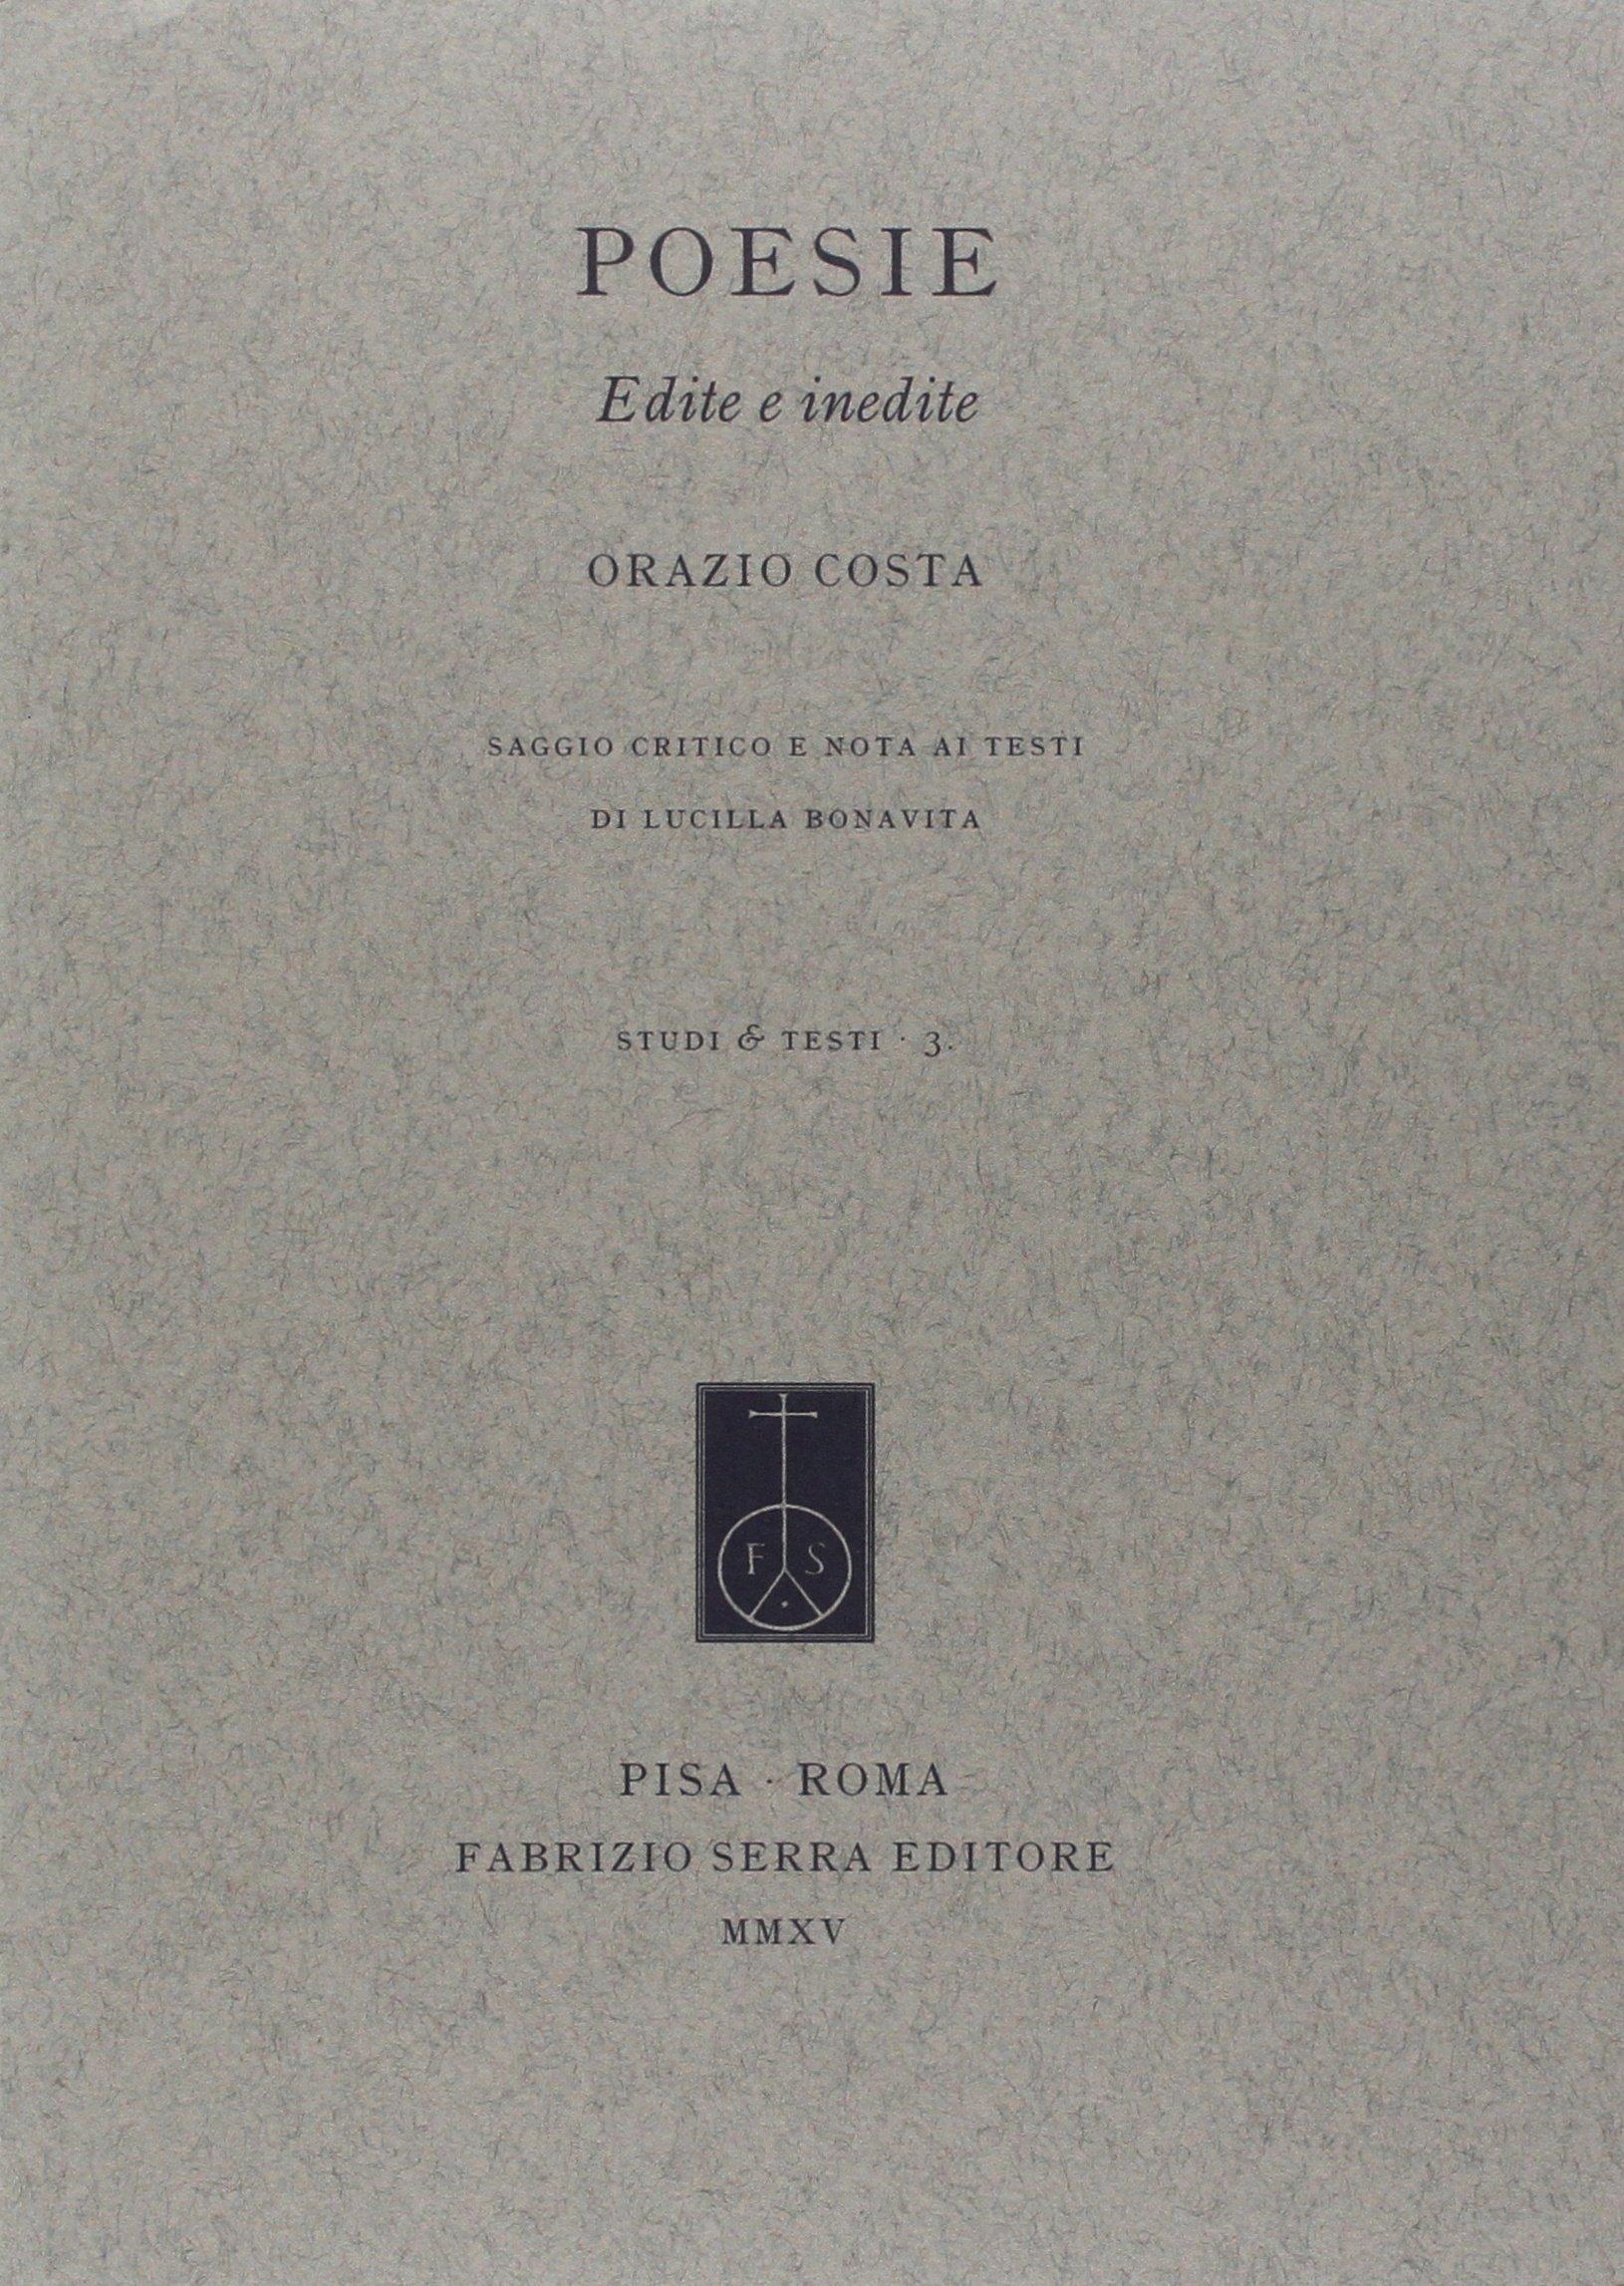 Poesie. Edite e inedite (Studi e testi): Amazon.es: Costa, Orazio, Bonavita, L.: Libros en idiomas extranjeros